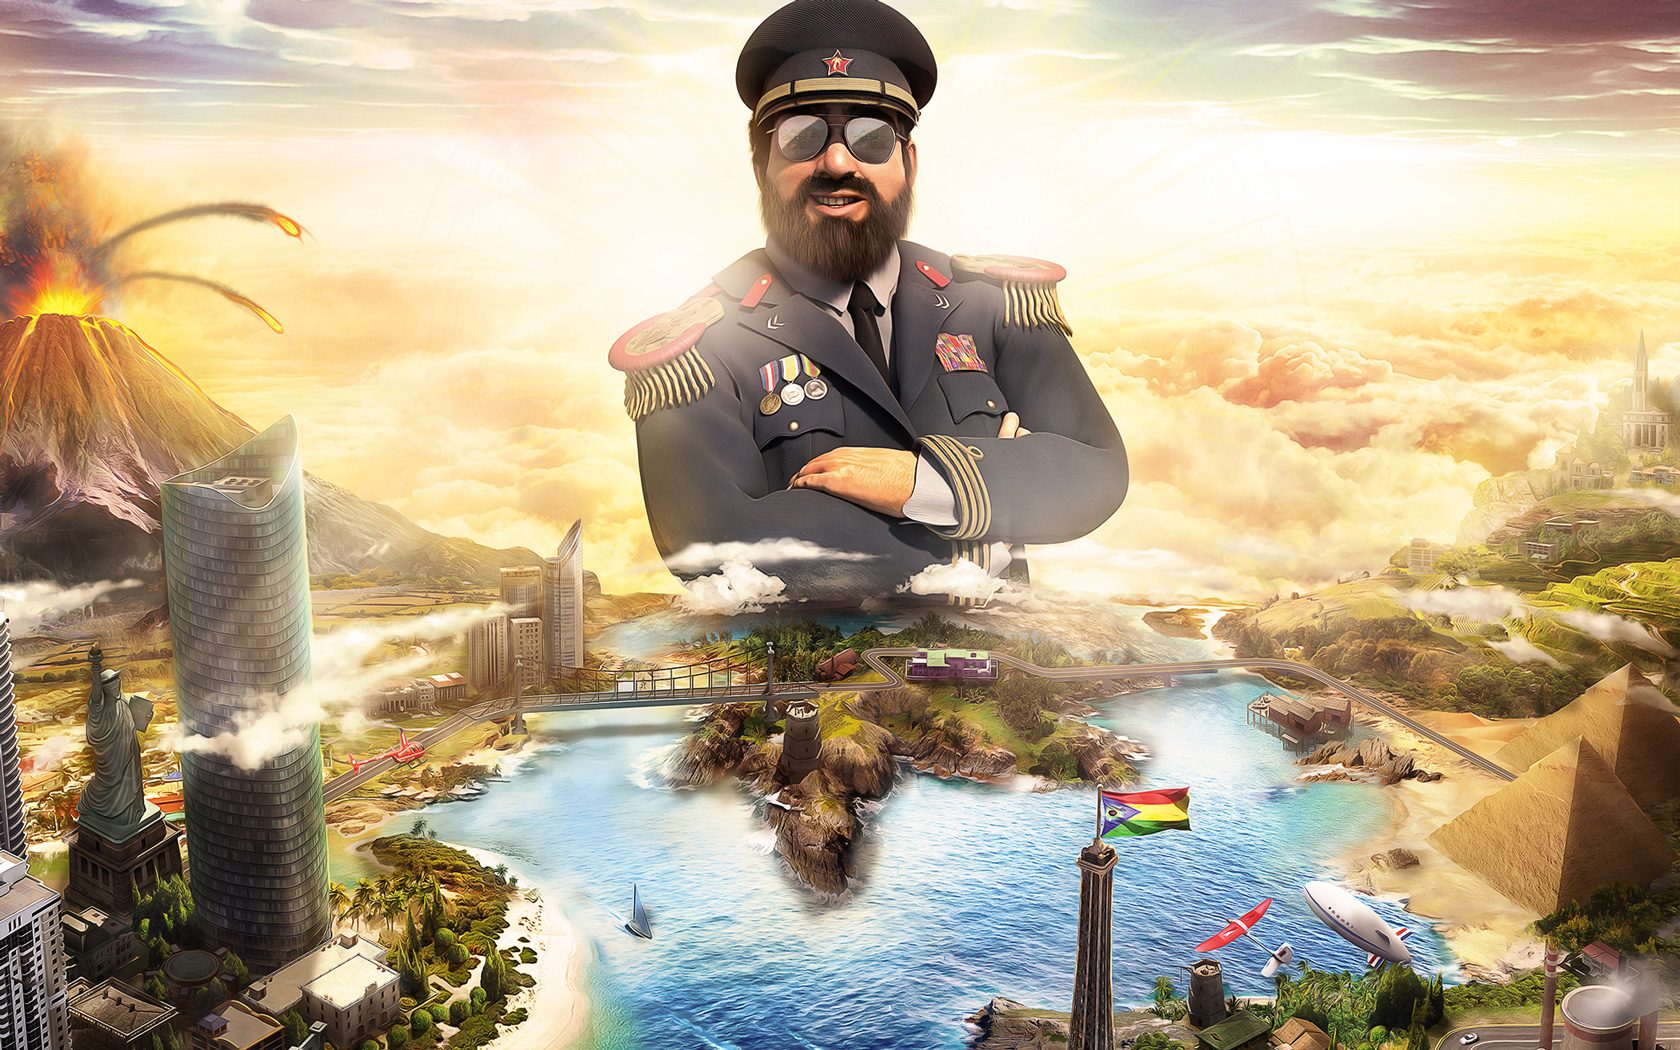 Free Tropico 6 Wallpaper in 1680x1050